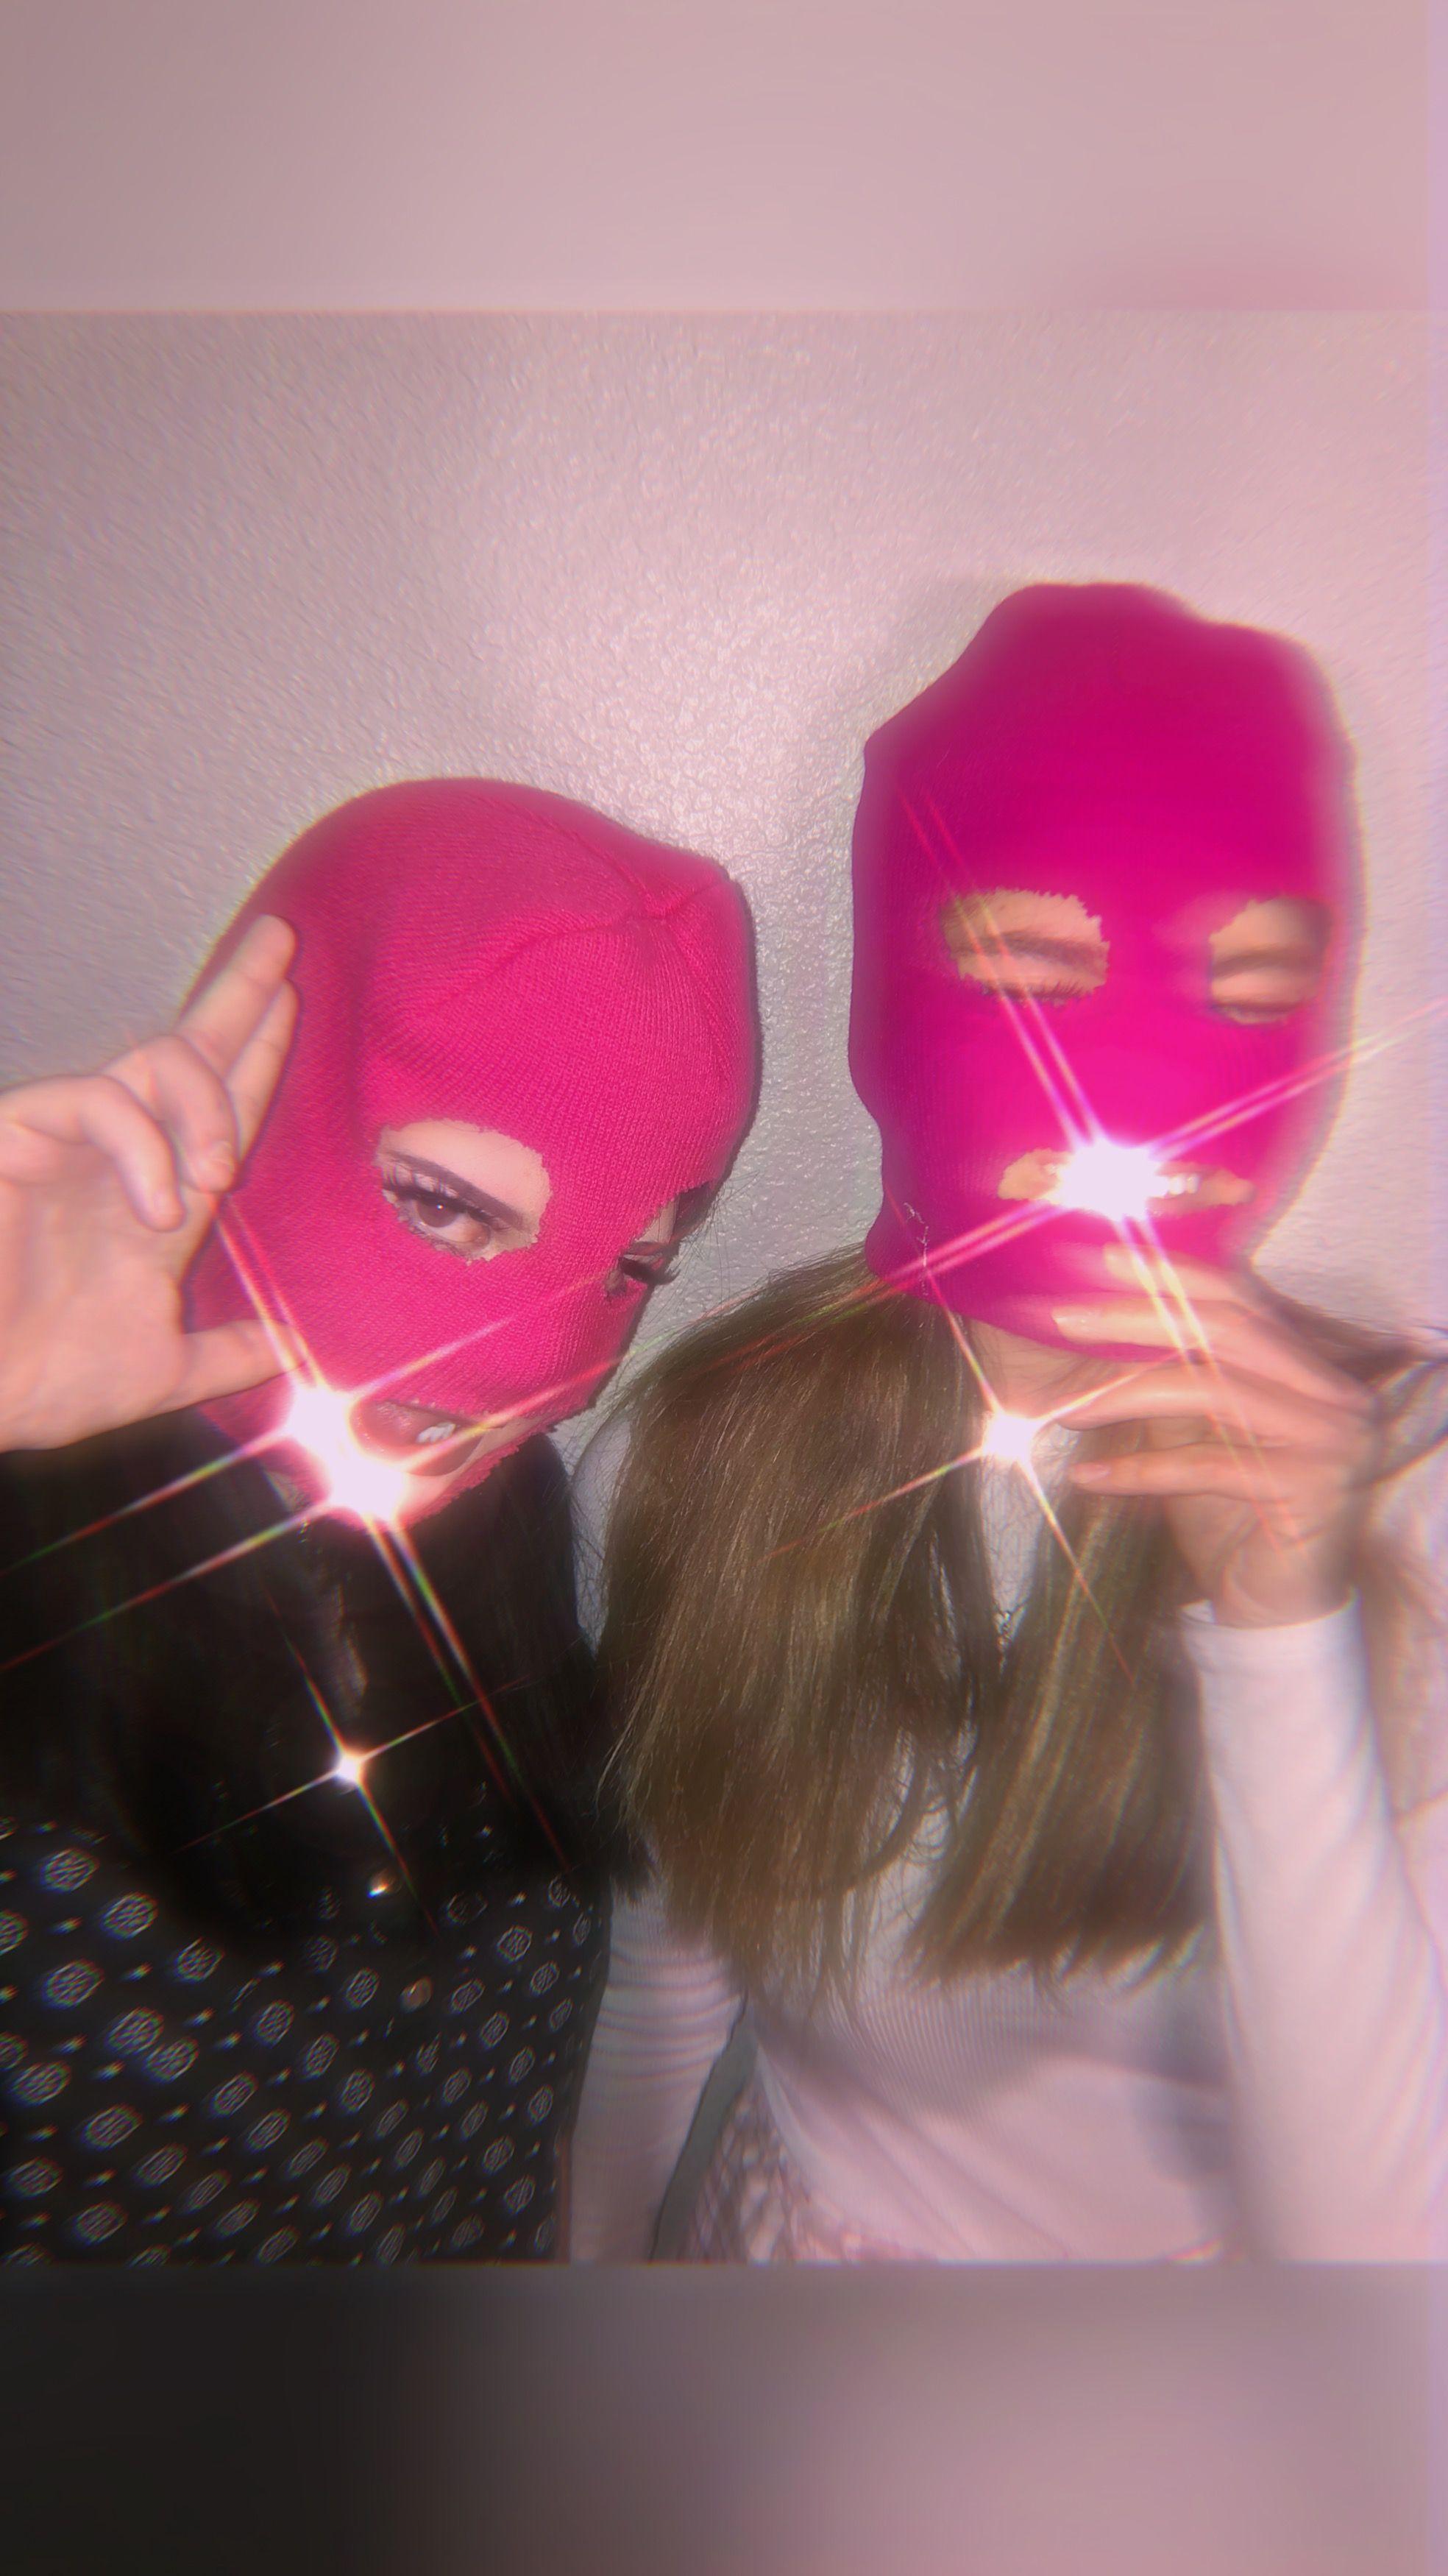 Wallpaper baddie gangsta ski mask aesthetic aesthetic masked girls wallpapers wallpaper cave etsy sellers. Baddie Wallpapers Ski Mask Pink : Grunge Girl Ski Mask Bad ...